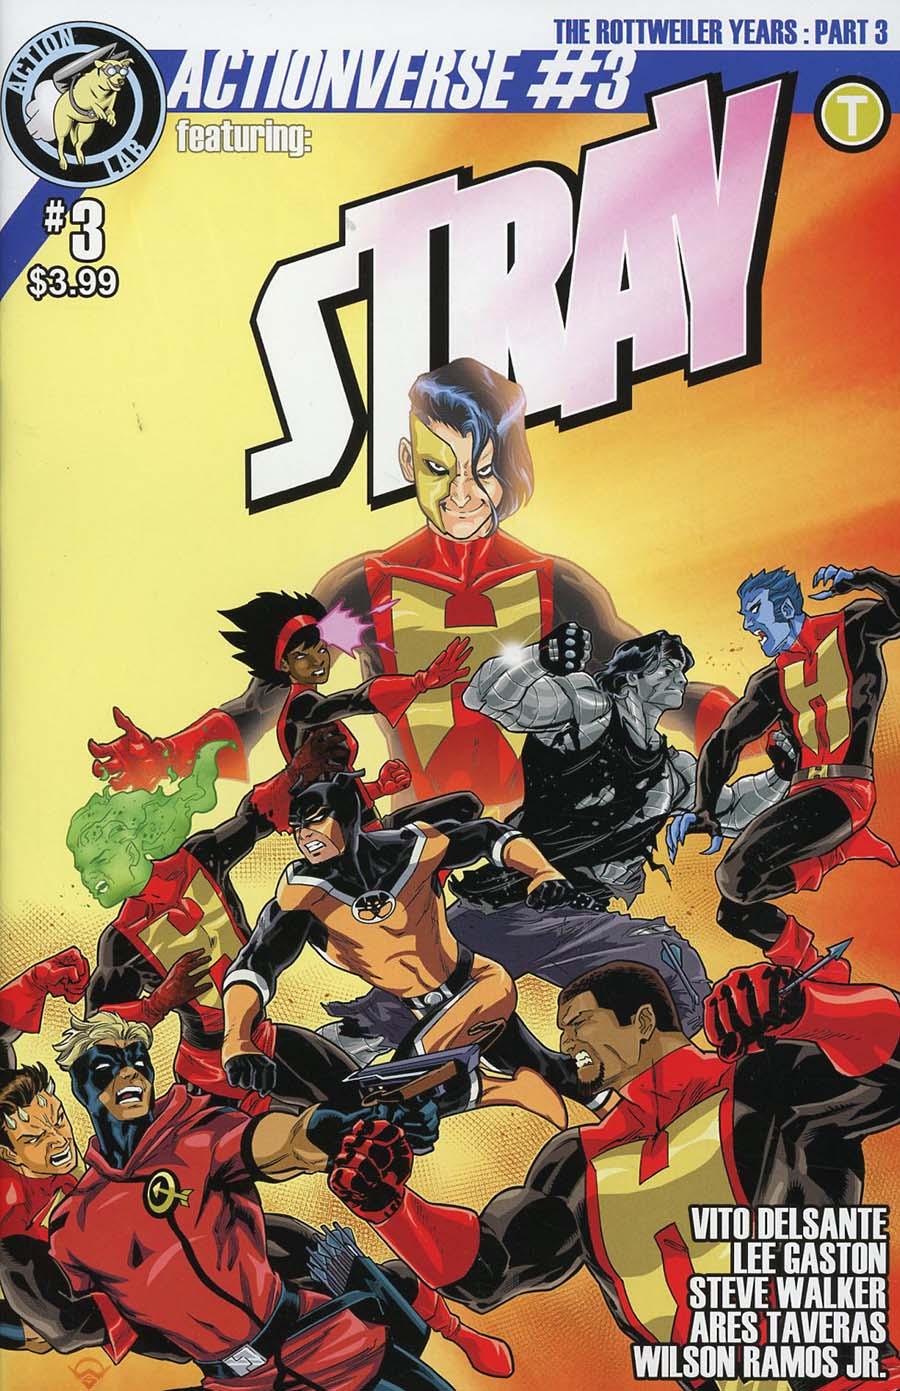 Actionverse Vol 2 #3 Stray Cover A Regular Sean Izaakse Cover